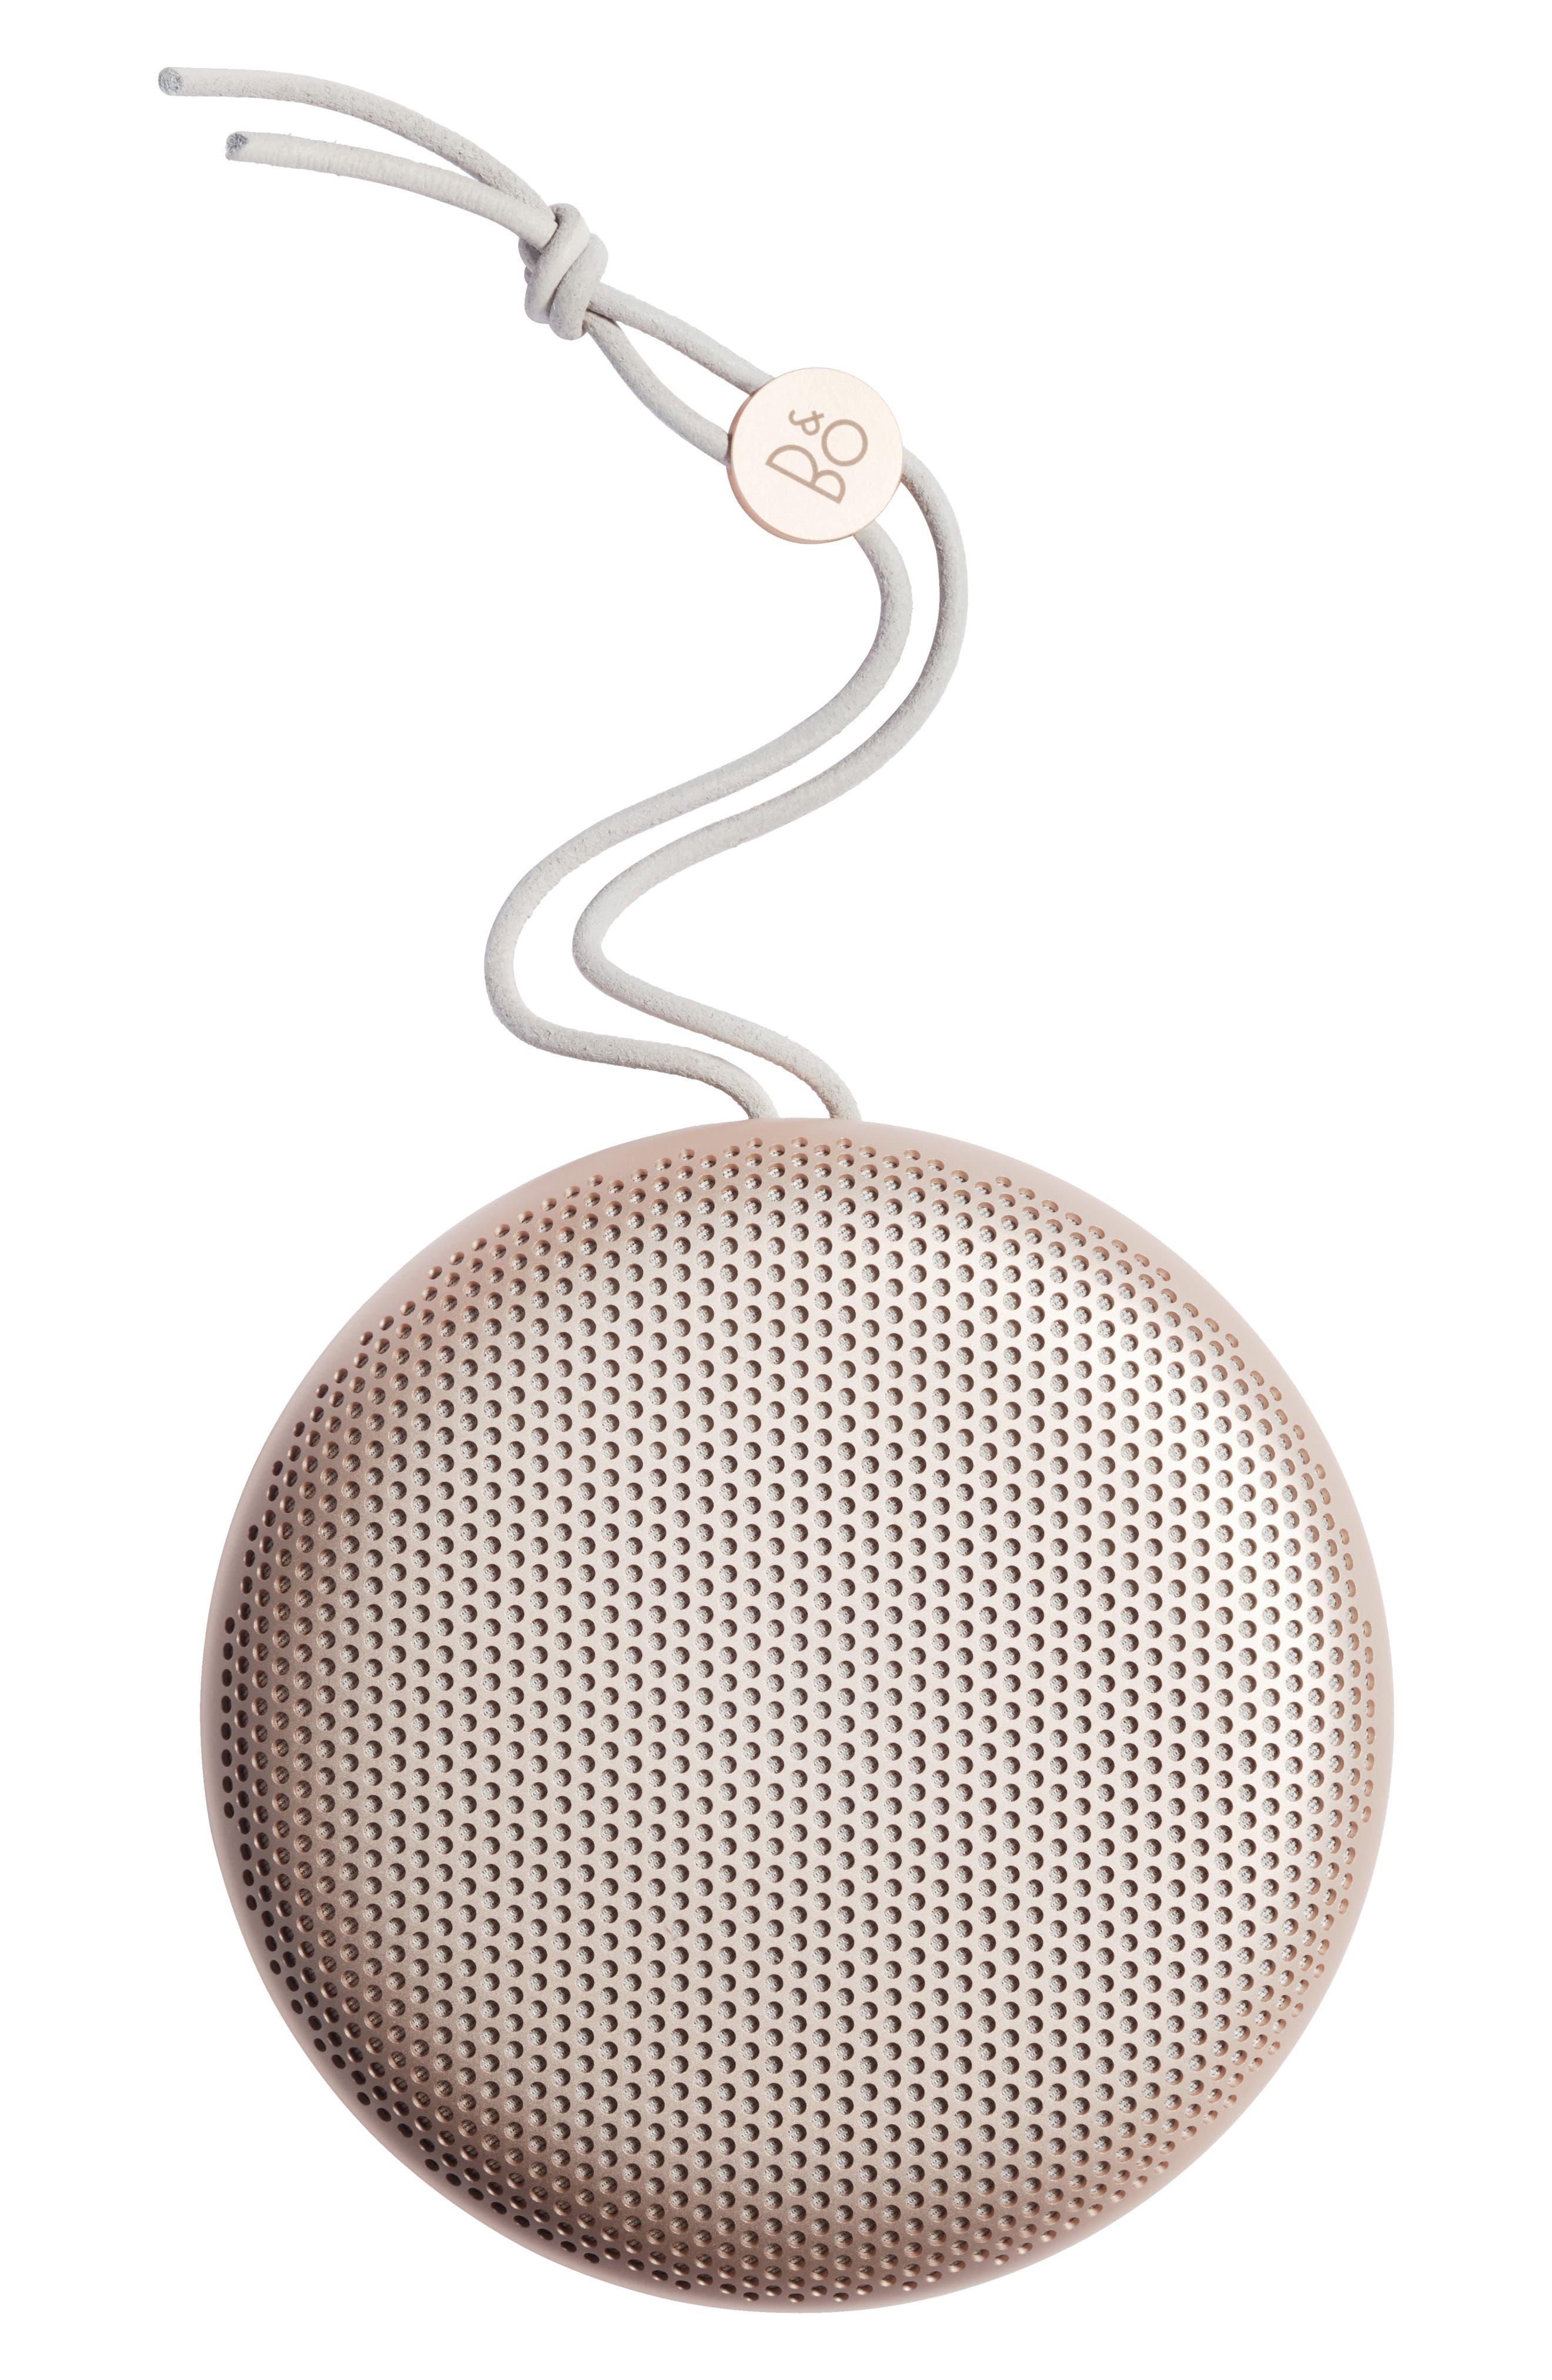 B&O PLAY A1 Portable Bluetooth Speaker